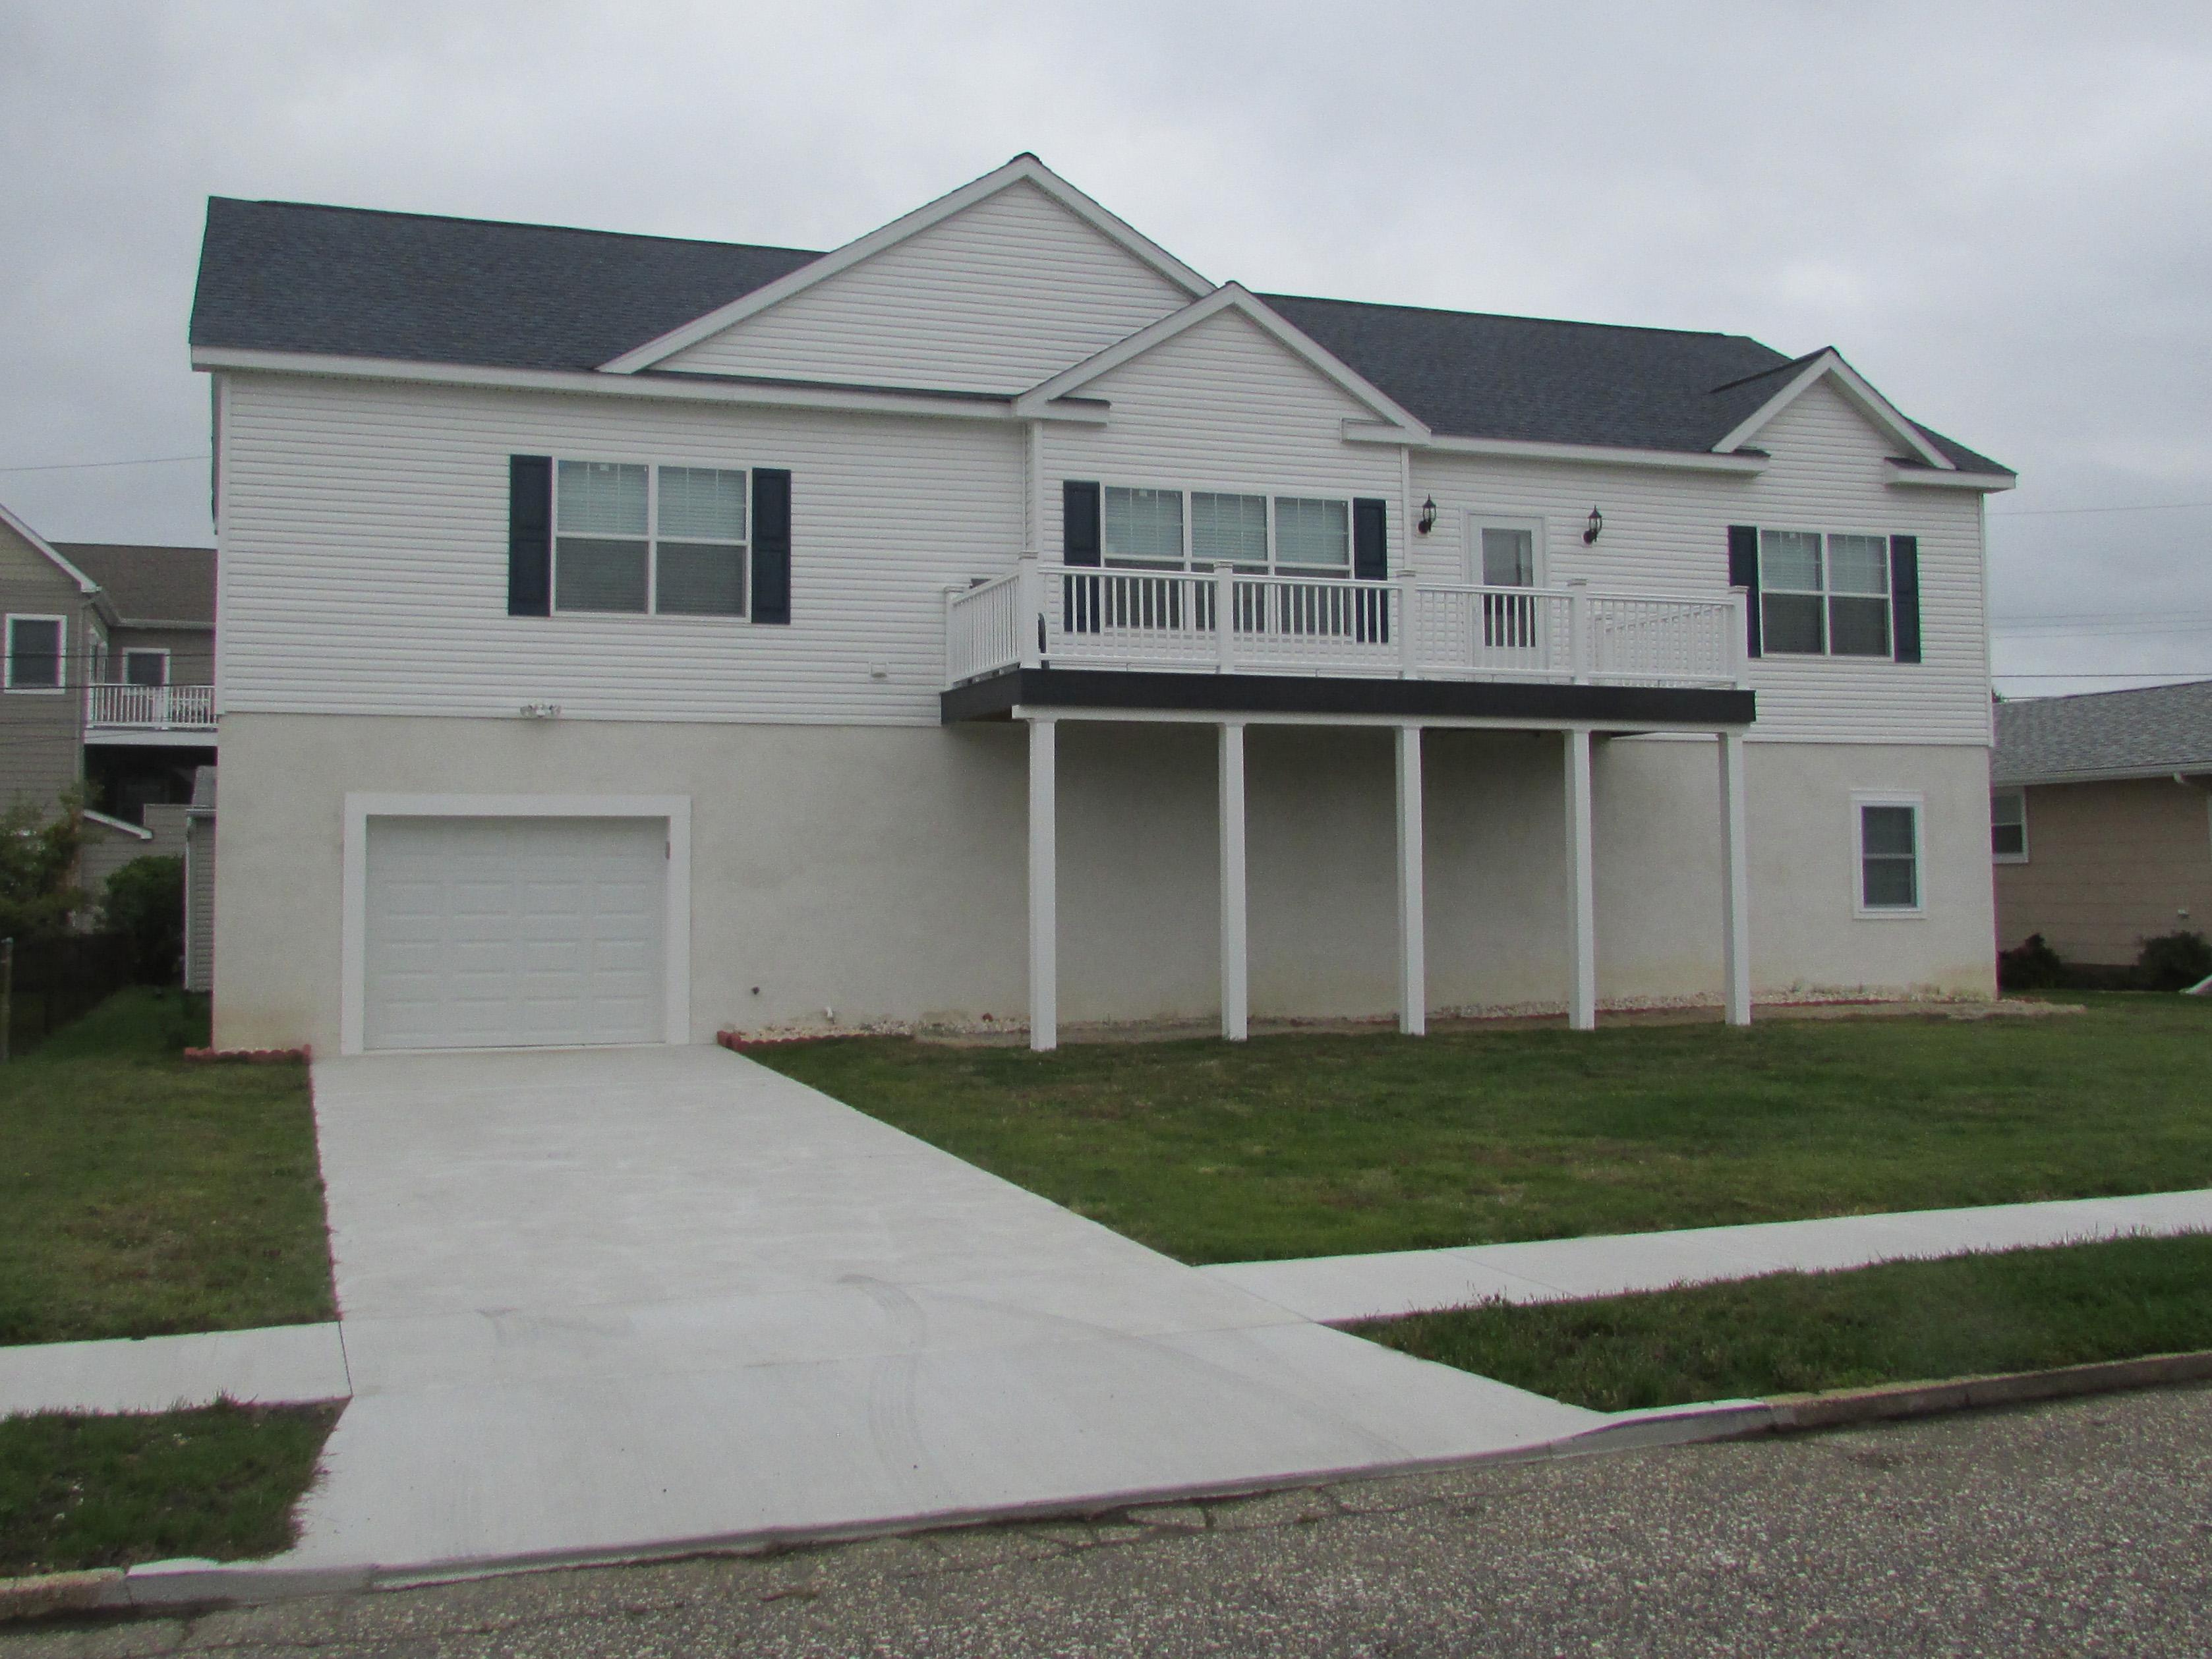 Coastal shore modular home photo tours - Coastal homes mobel ...